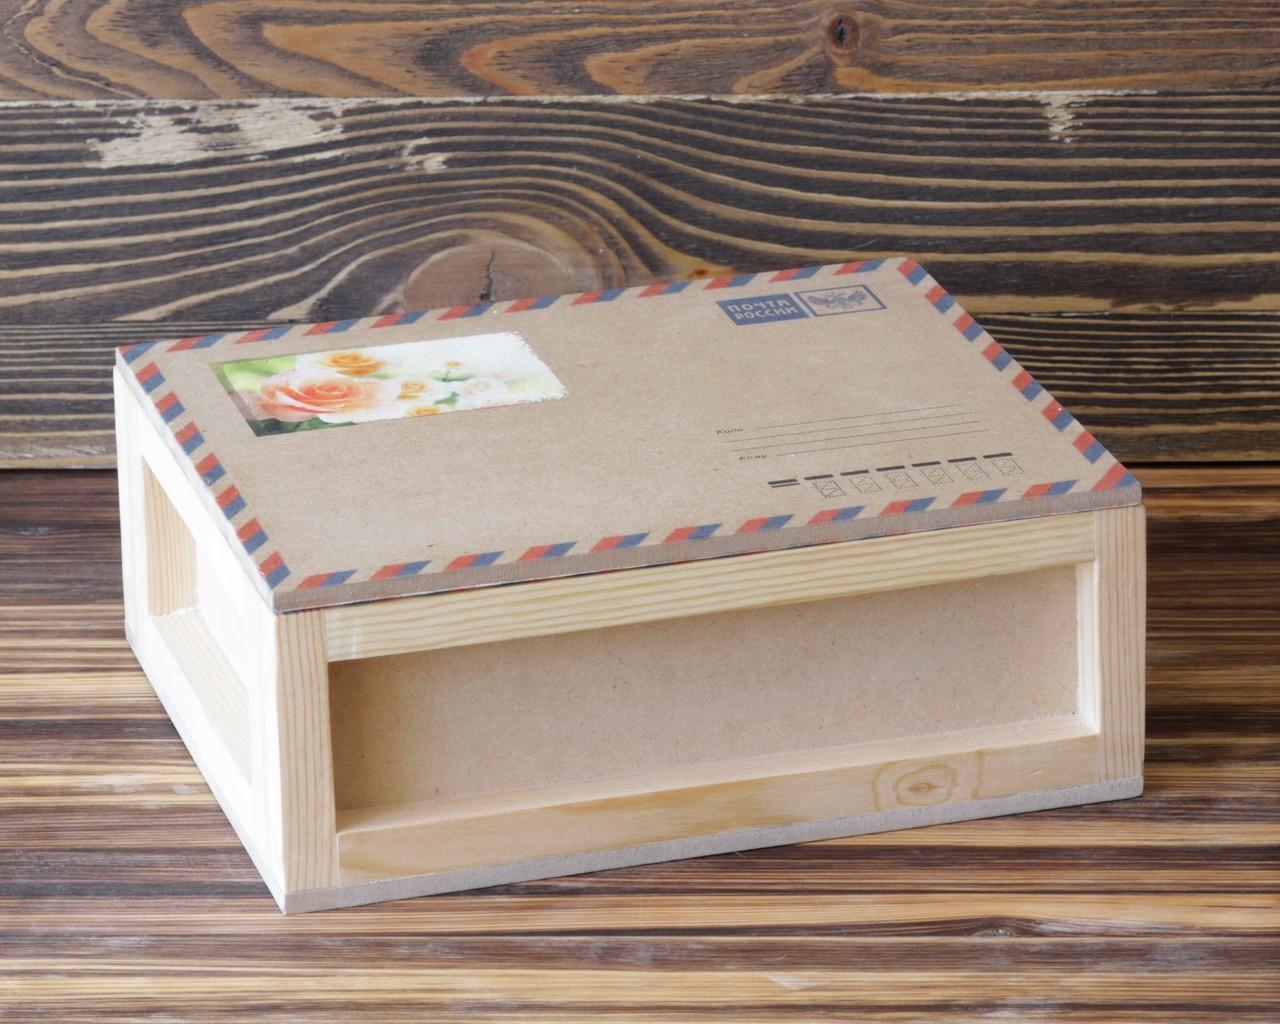 Посылочный ящик 21х14,5х7 см